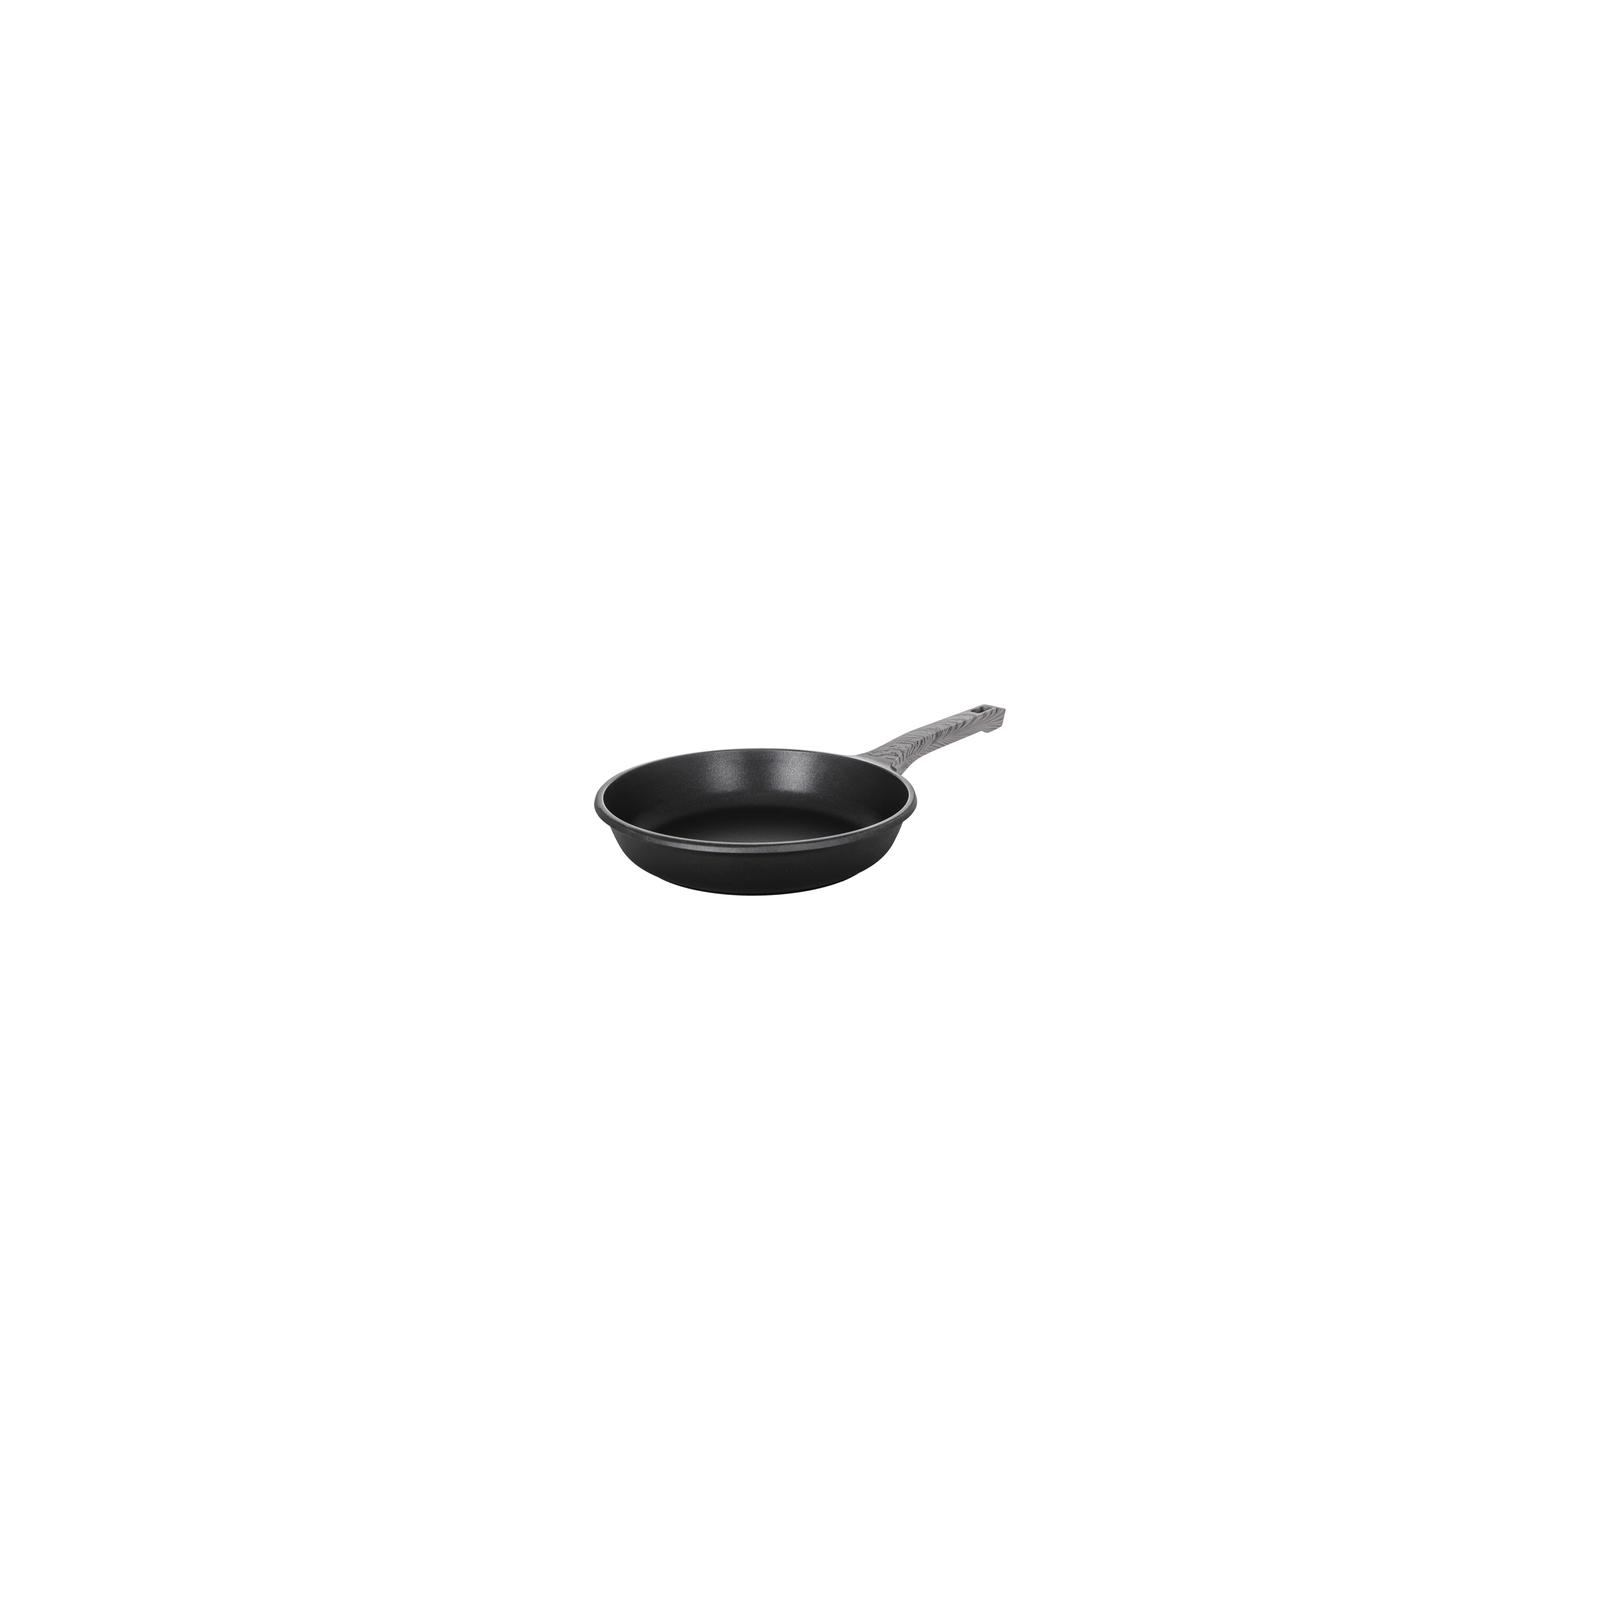 Сковорода Ringel IQ Smart 24 см (RG-1124-24)